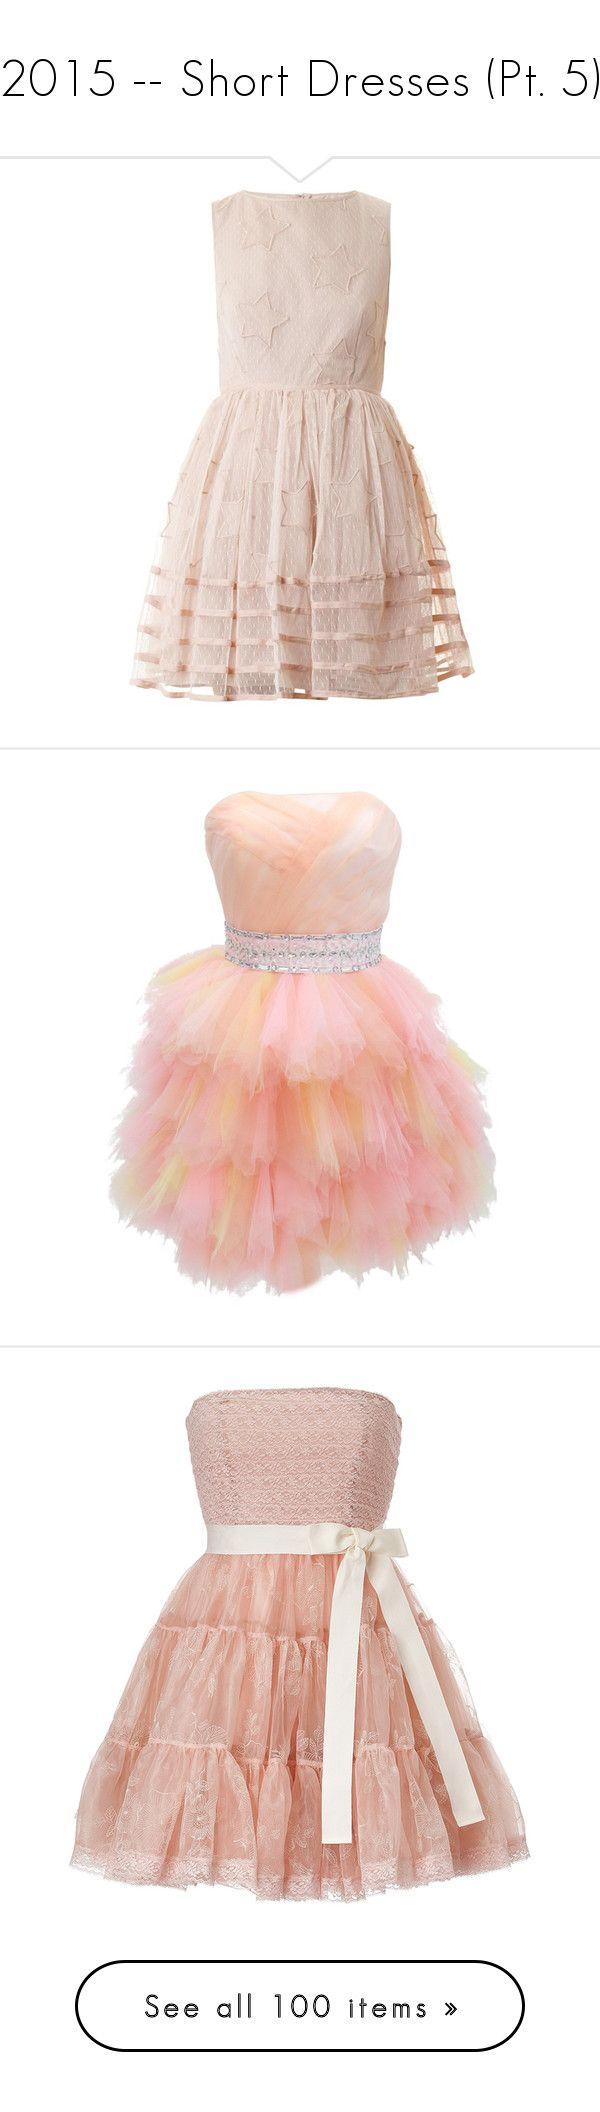 """2015 -- Short Dresses (Pt. 5)"" by kyla-perez-santiago ❤ liked on Polyvore featuring dresses, vestidos, light pink, mini party dresses, pink polka dot dress, embroidered dress, going out dresses, pink mini dress, gowns and short cocktail dresses"